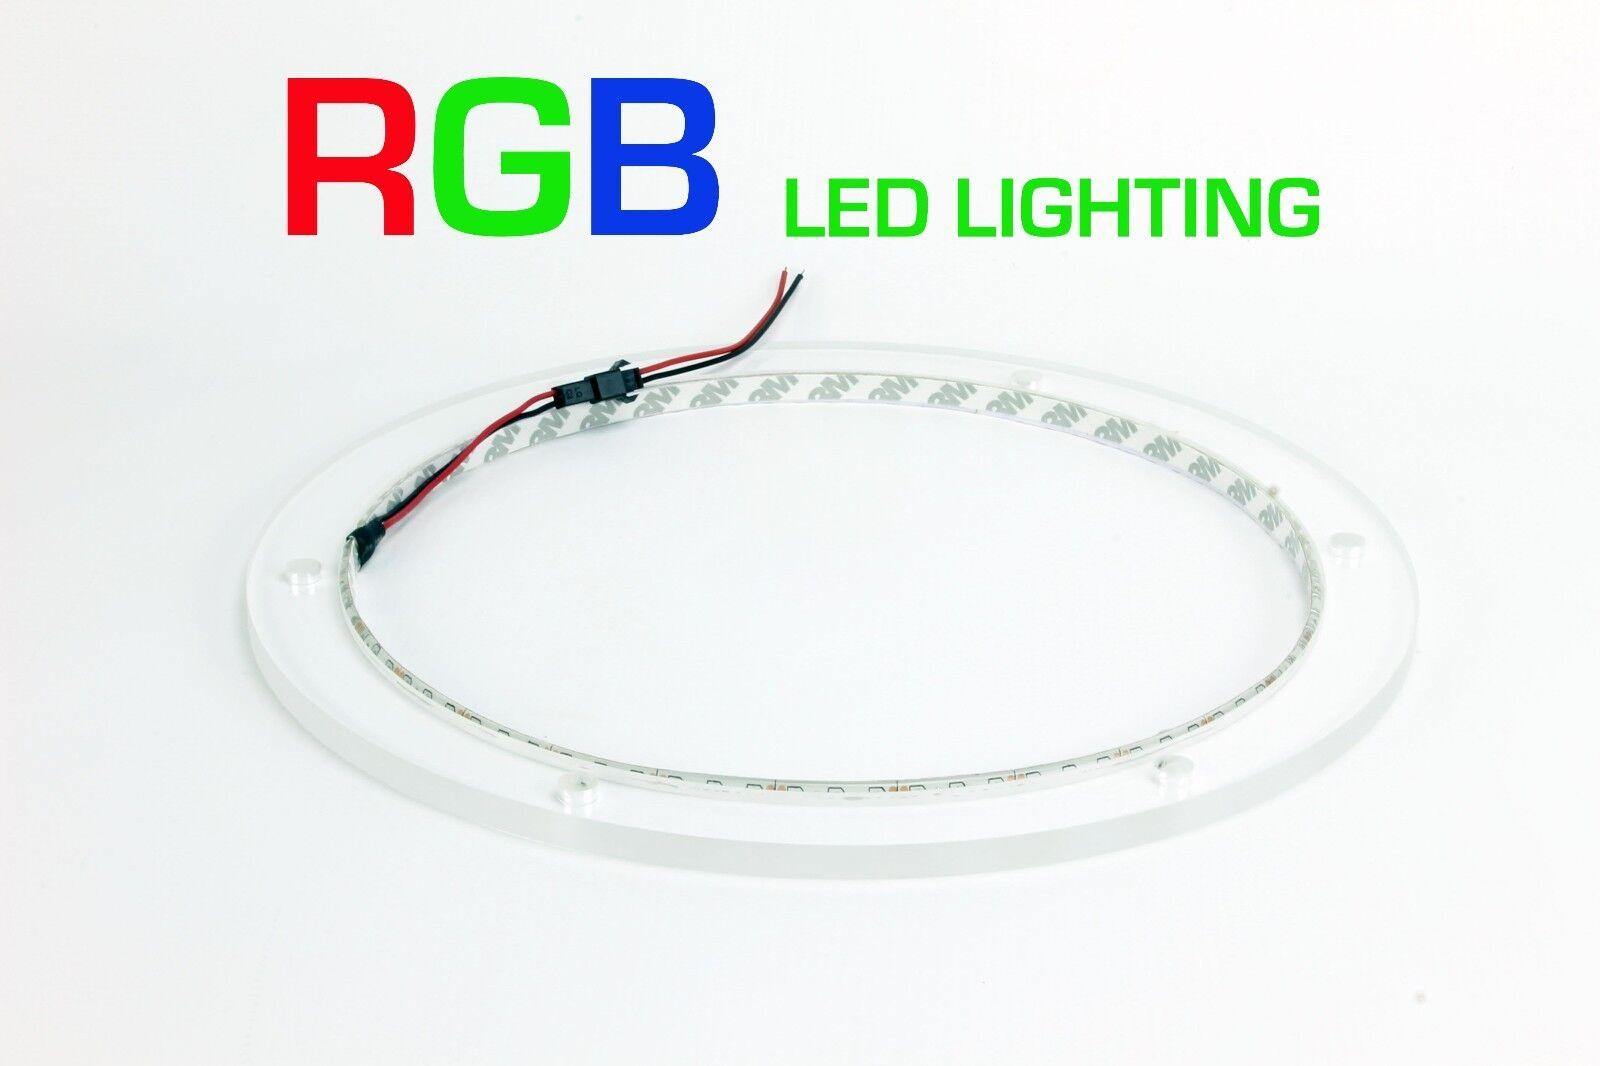 5pc RGB LED Speaker Rings for Mastercraft JL Audio M770 M10IB5 Ready to Install!